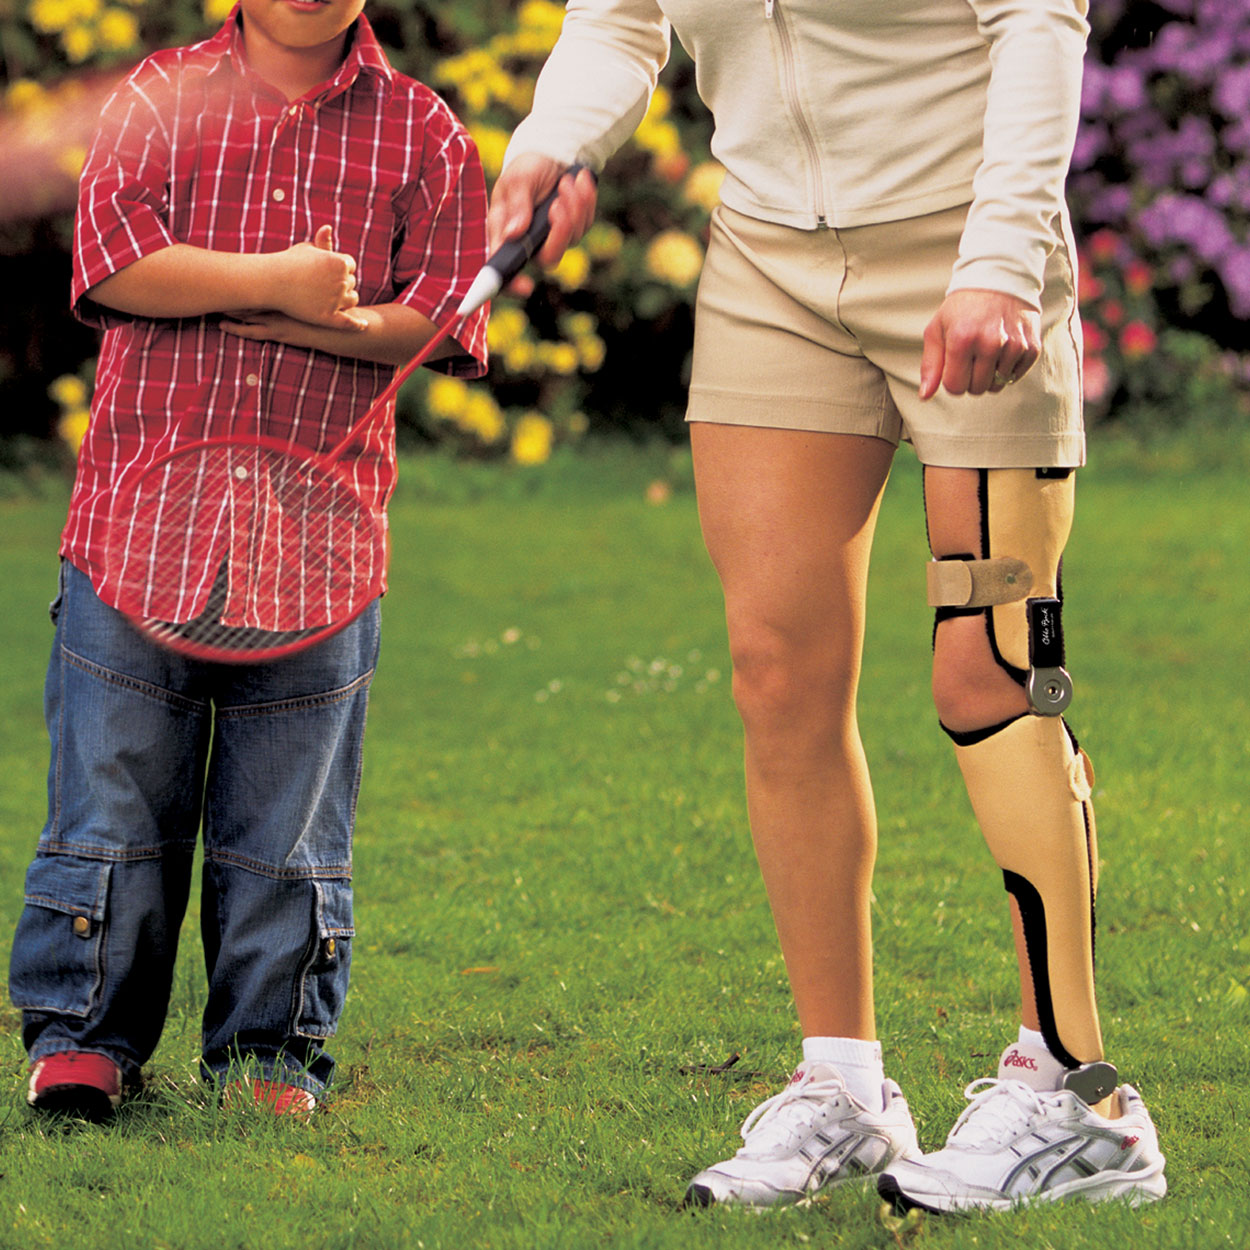 northeast-orthotics-and-prosthetics-ri-lower-orthotic-solutions.jpg